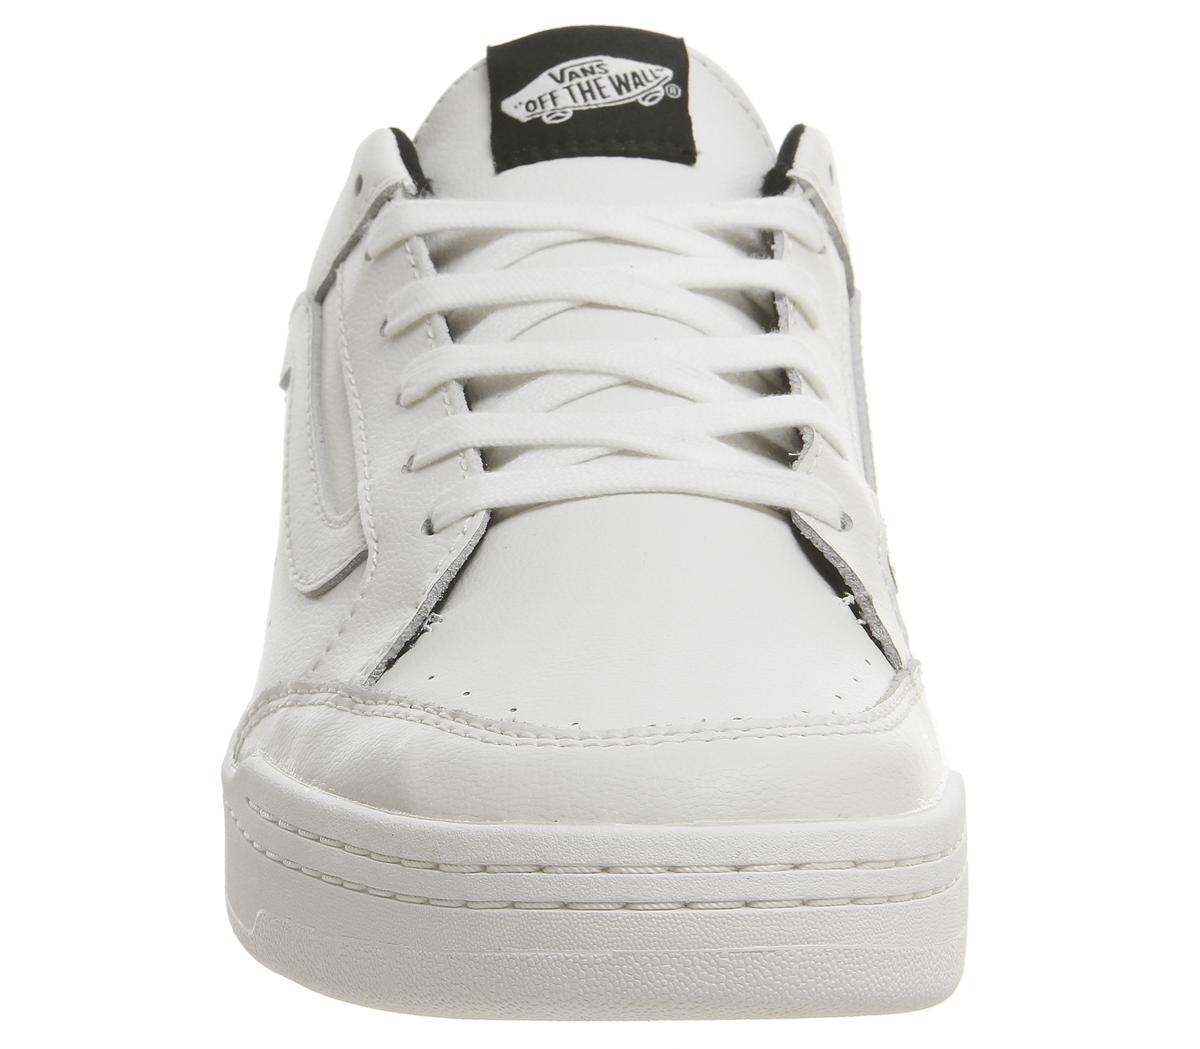 Shoes Black Vans Trainers Blanc Highland IPq0qwF